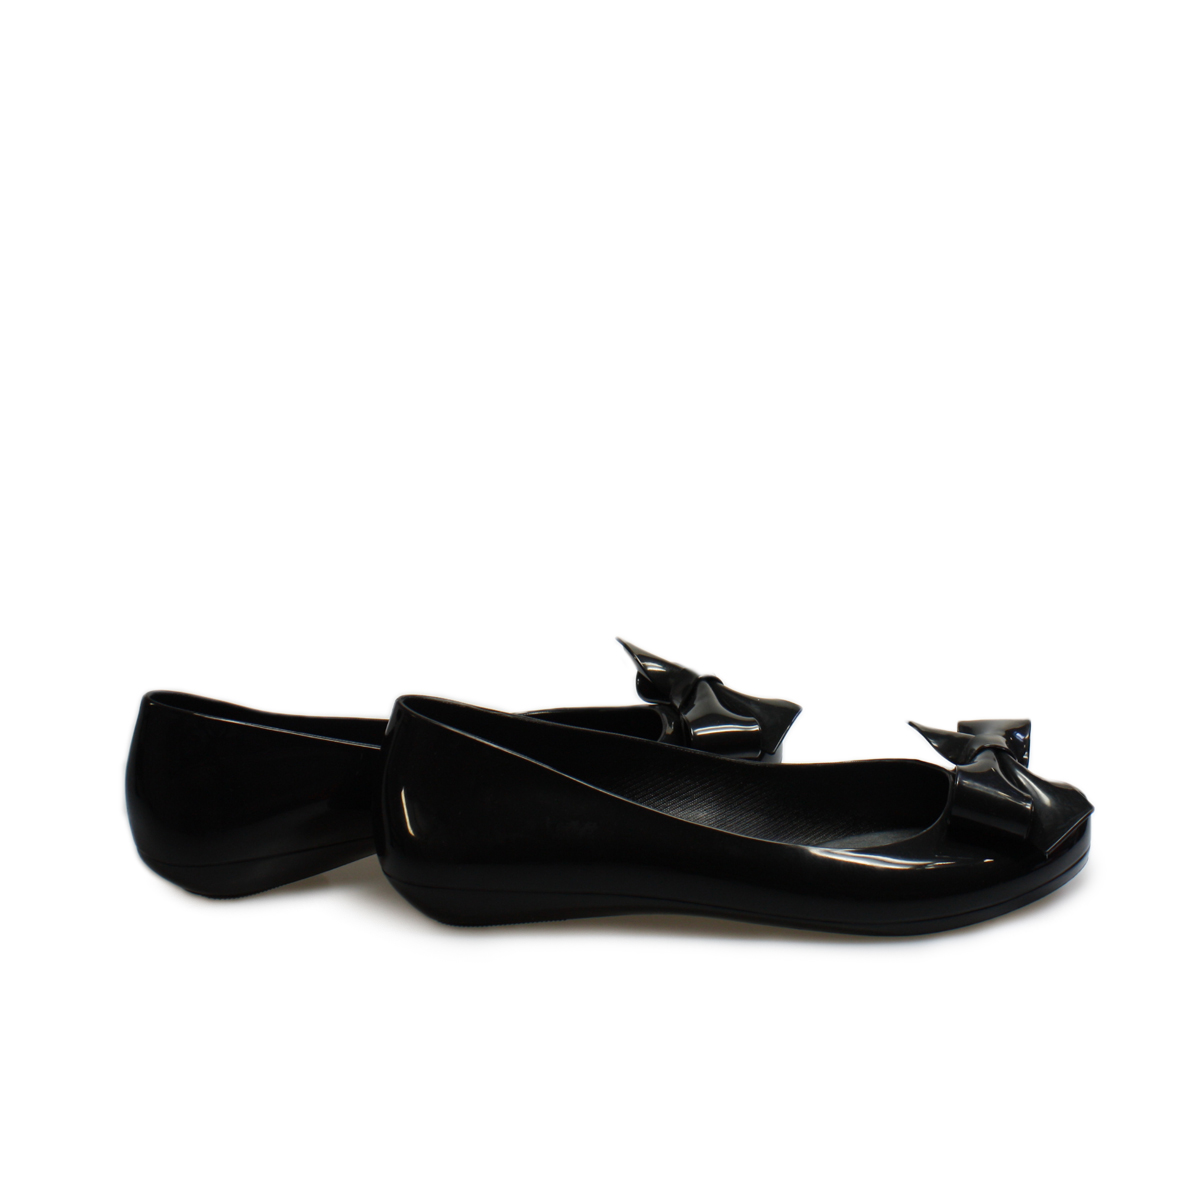 Mel Black Ballerina Pumps - UK size 3